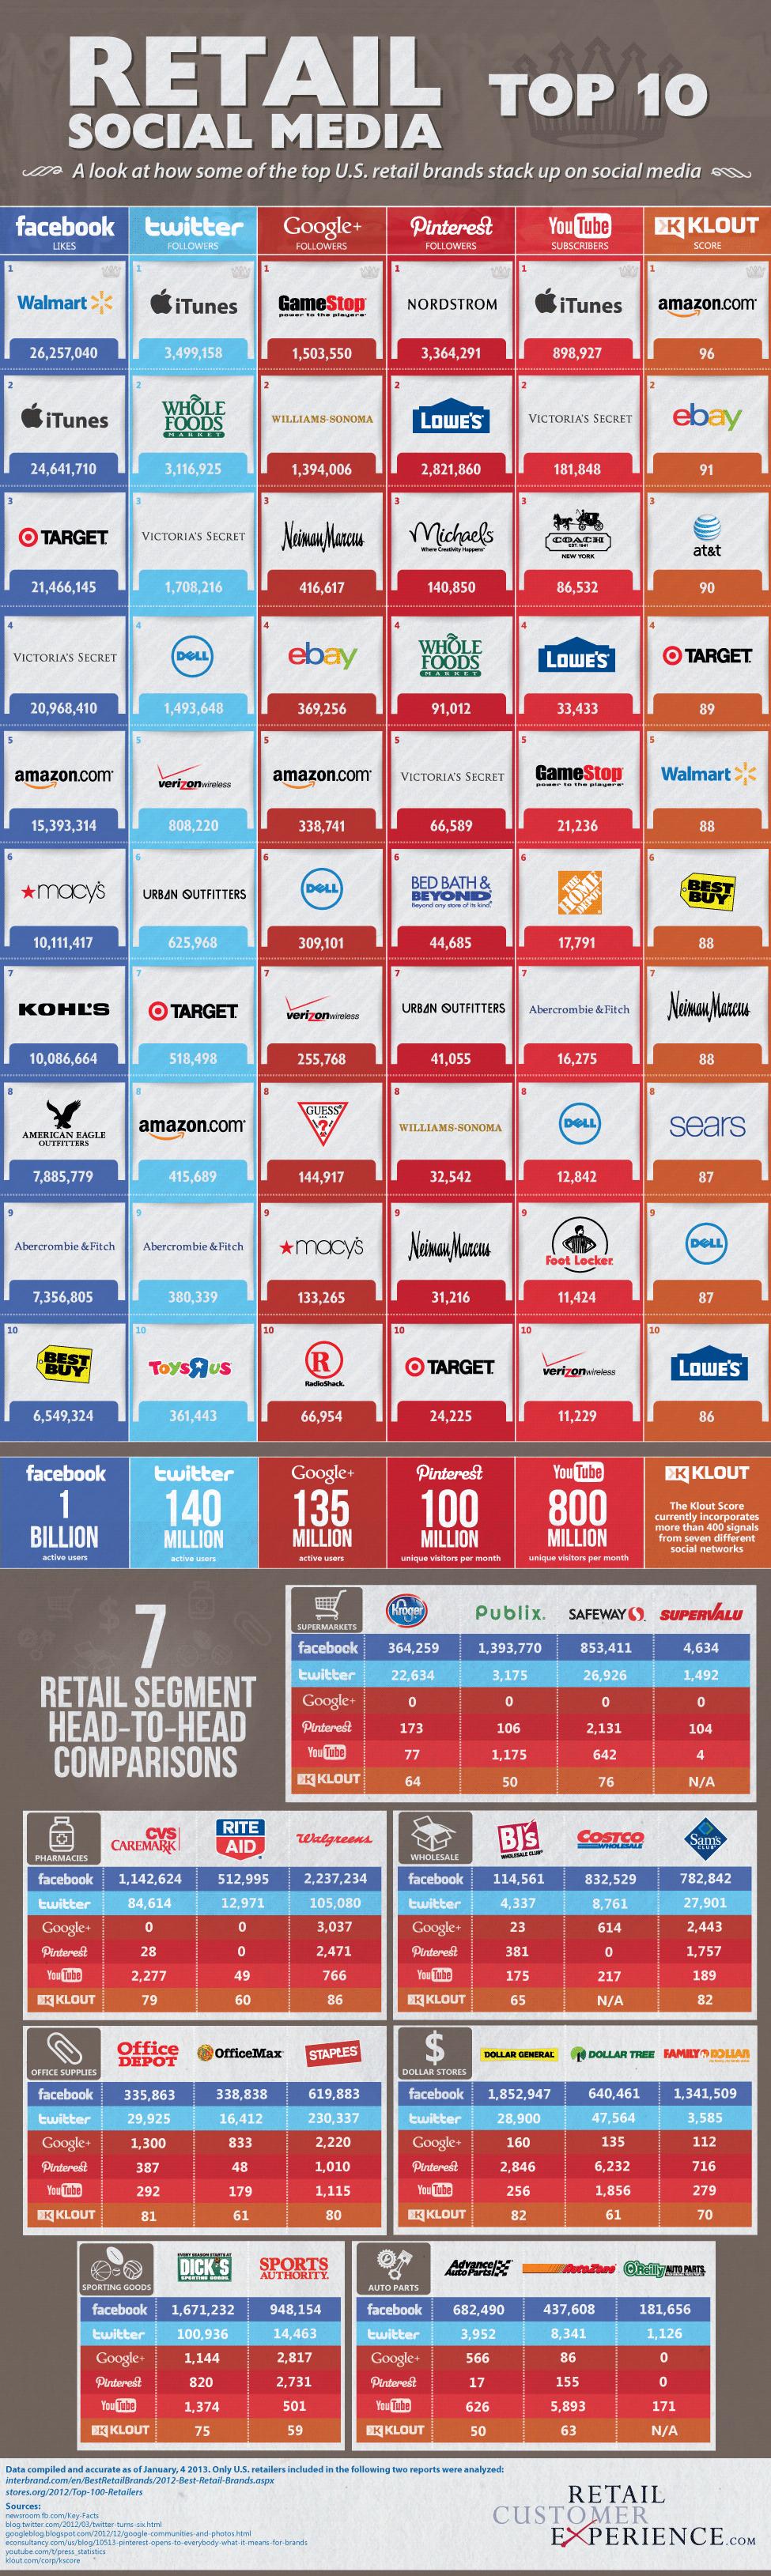 Retail Social Media Top 10